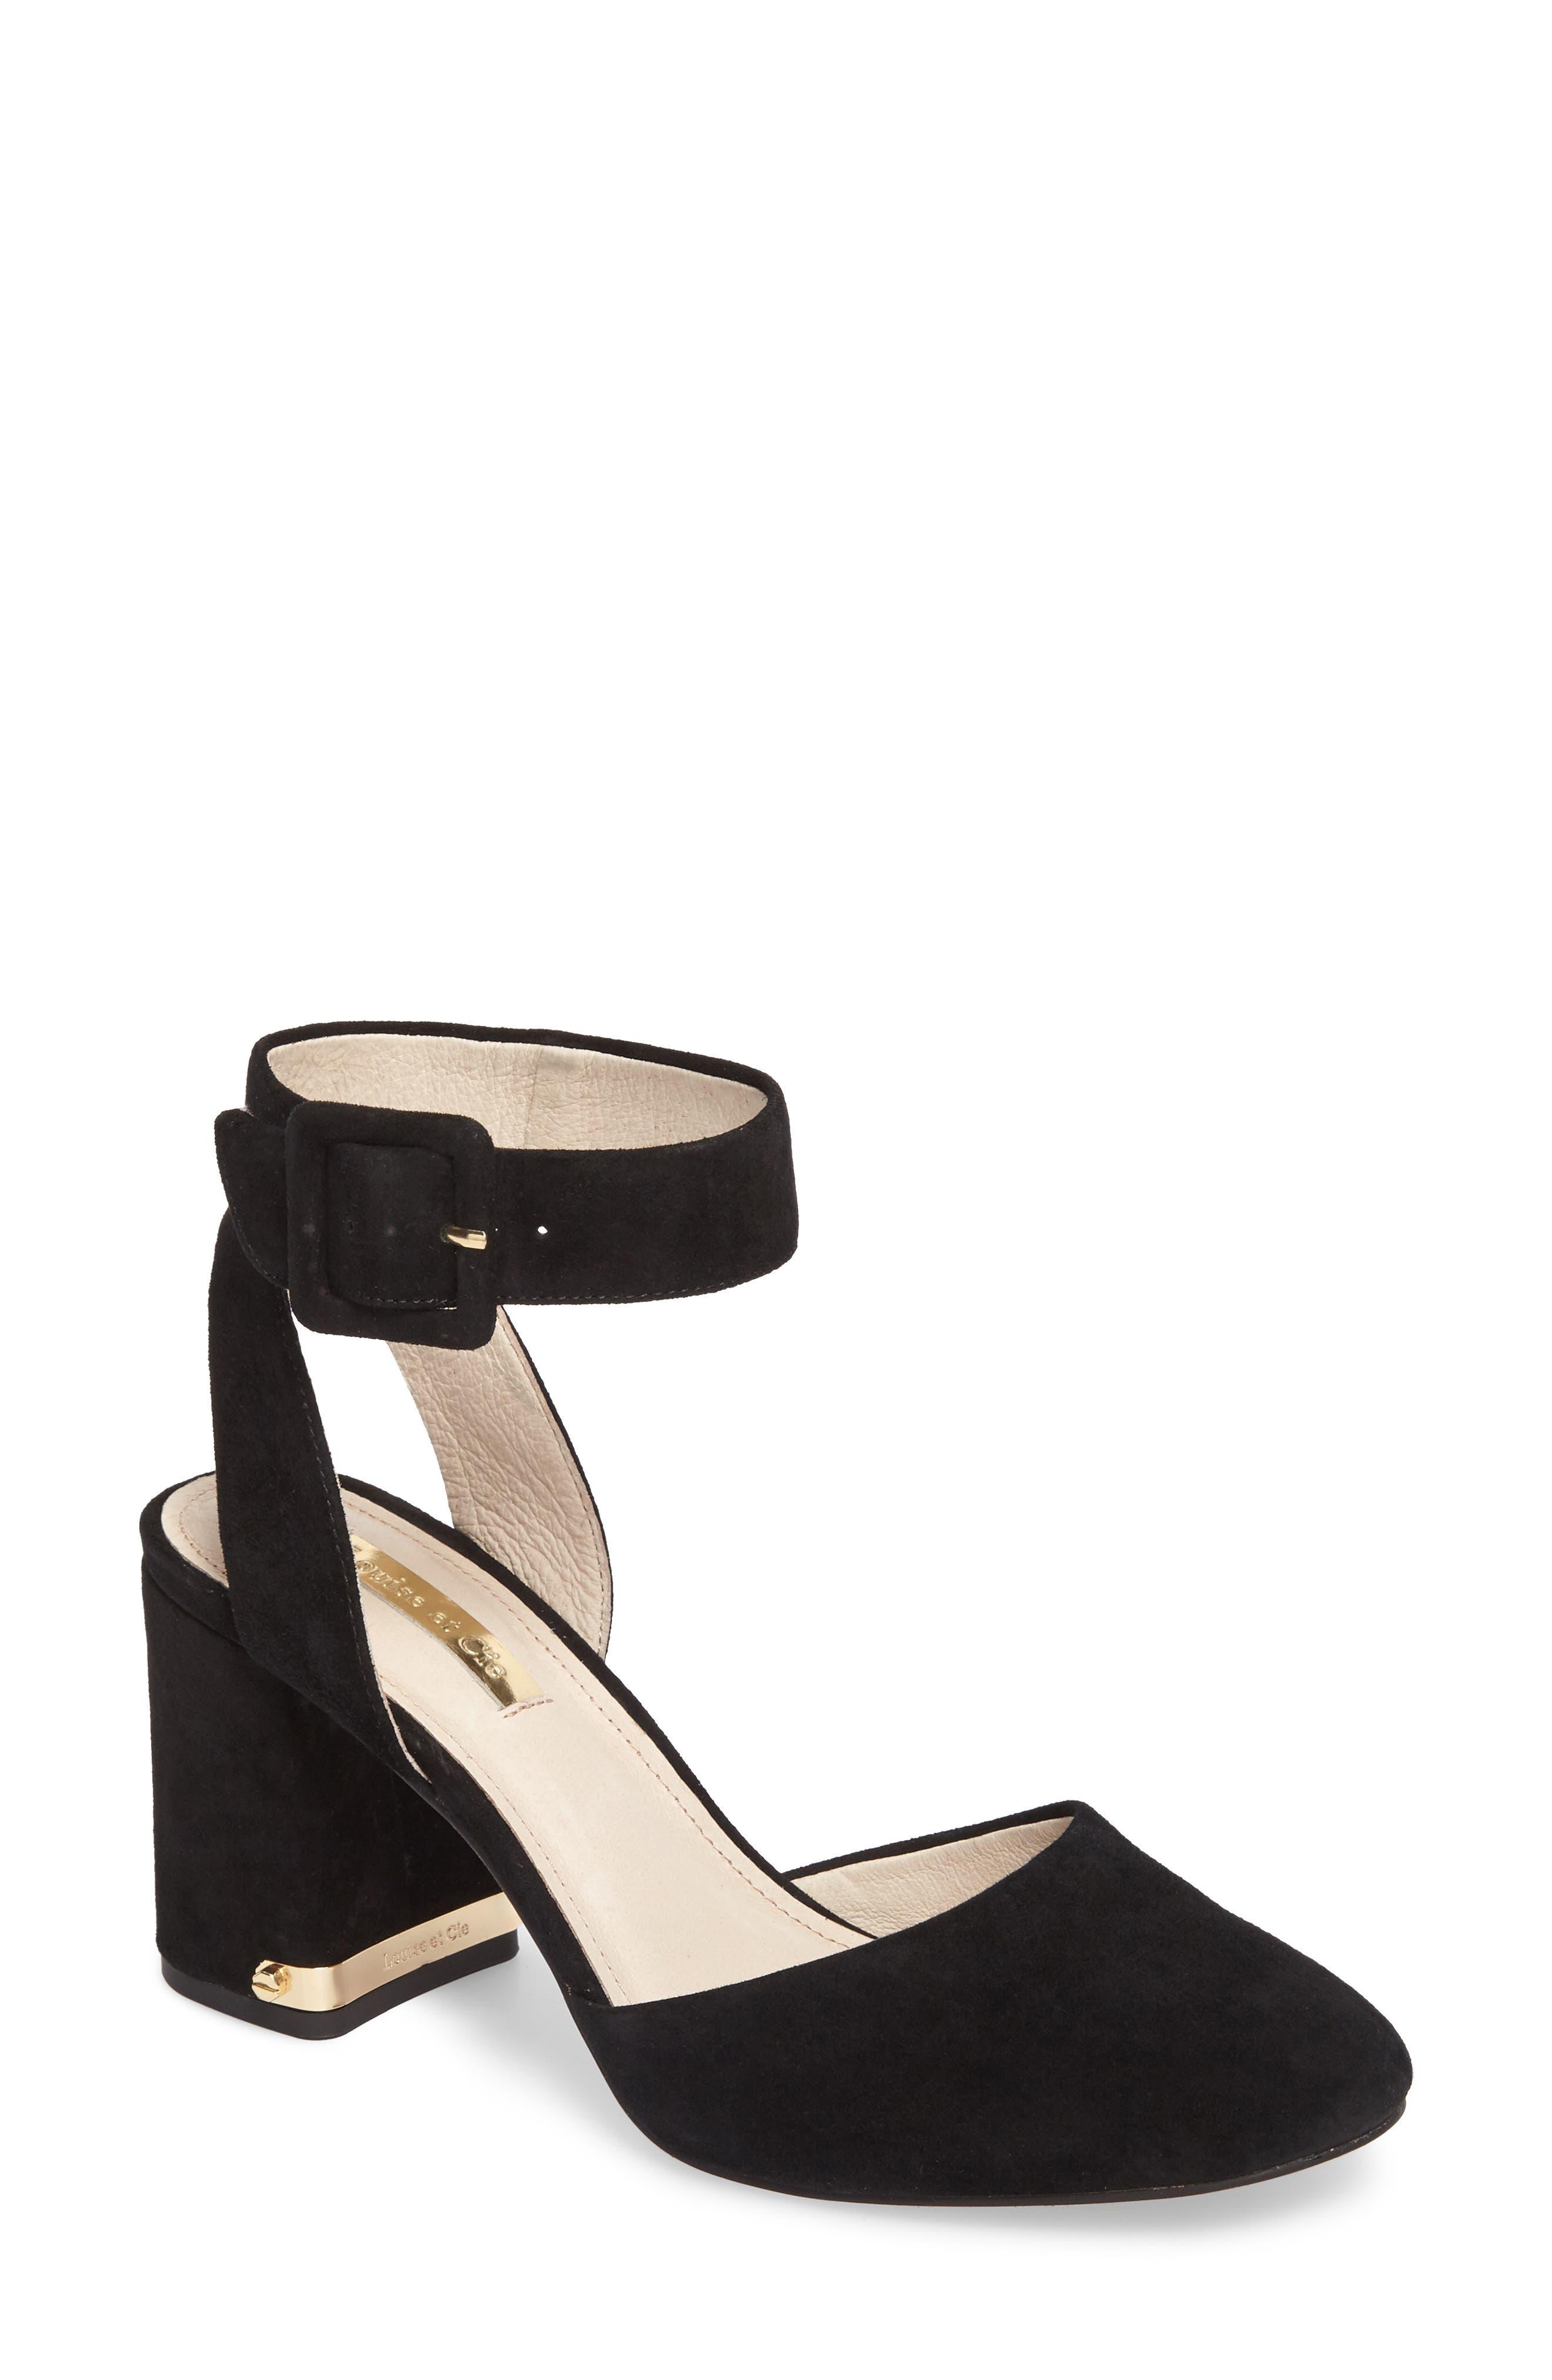 Ines Ankle Strap Pump,                         Main,                         color, Black Suede